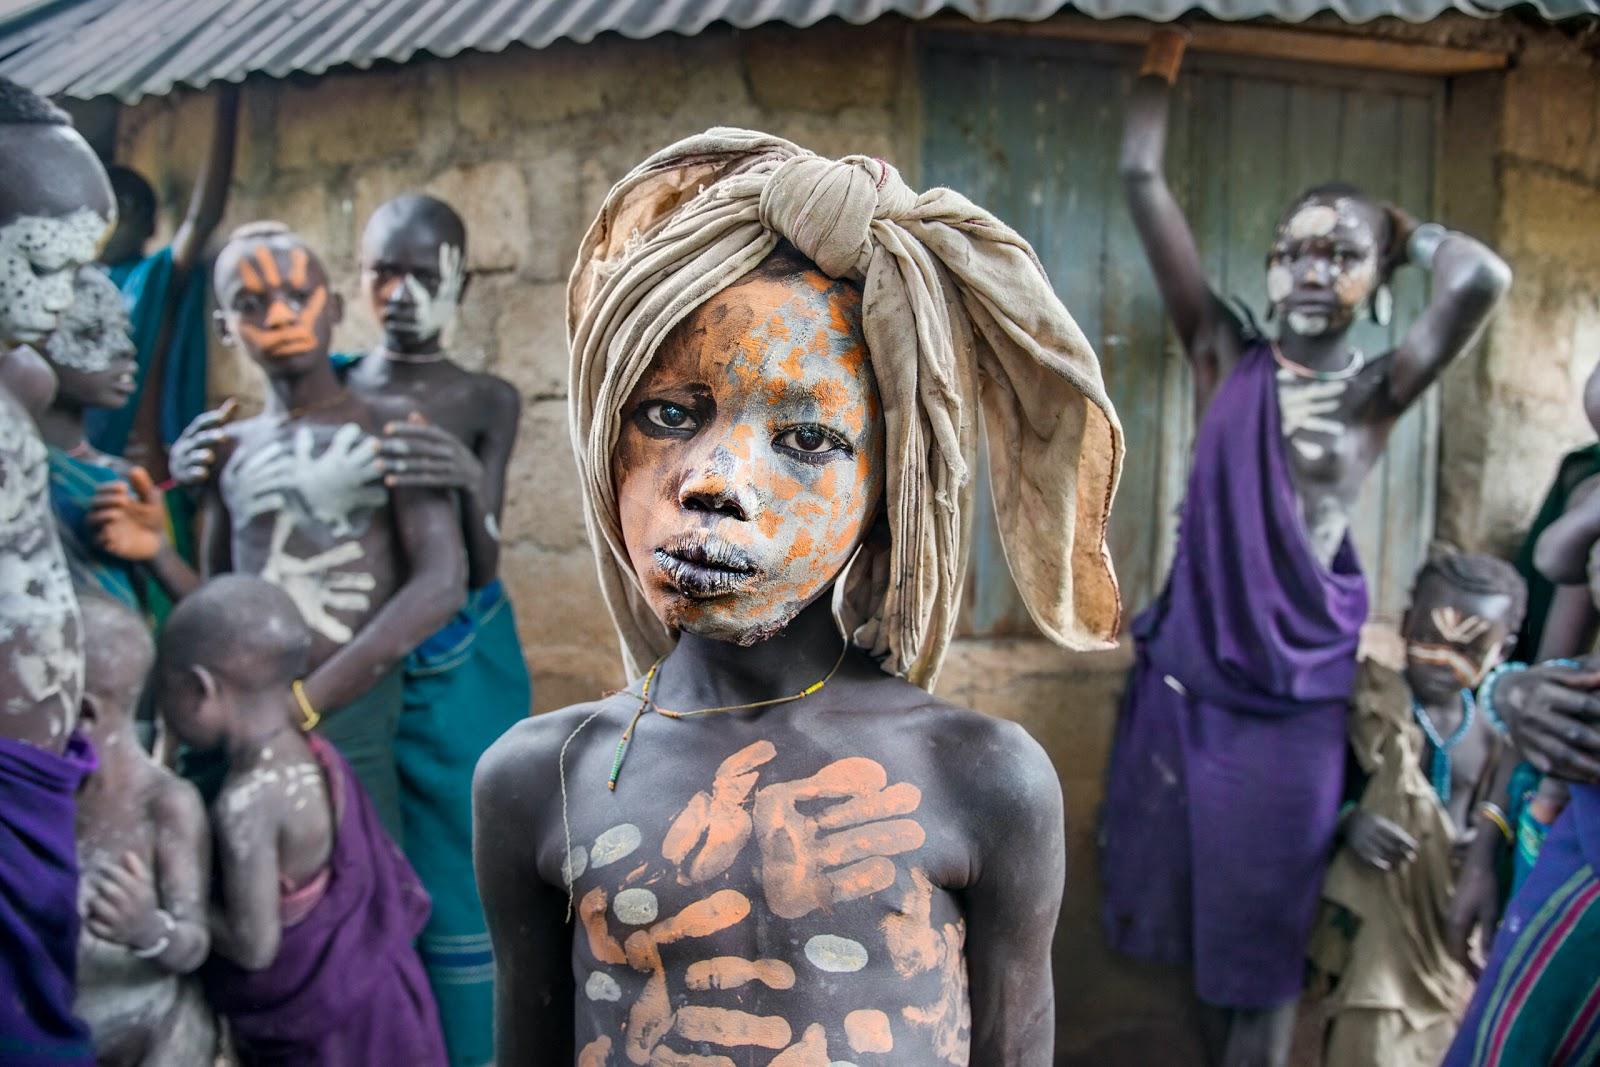 Suri boy, 2014, McCurry